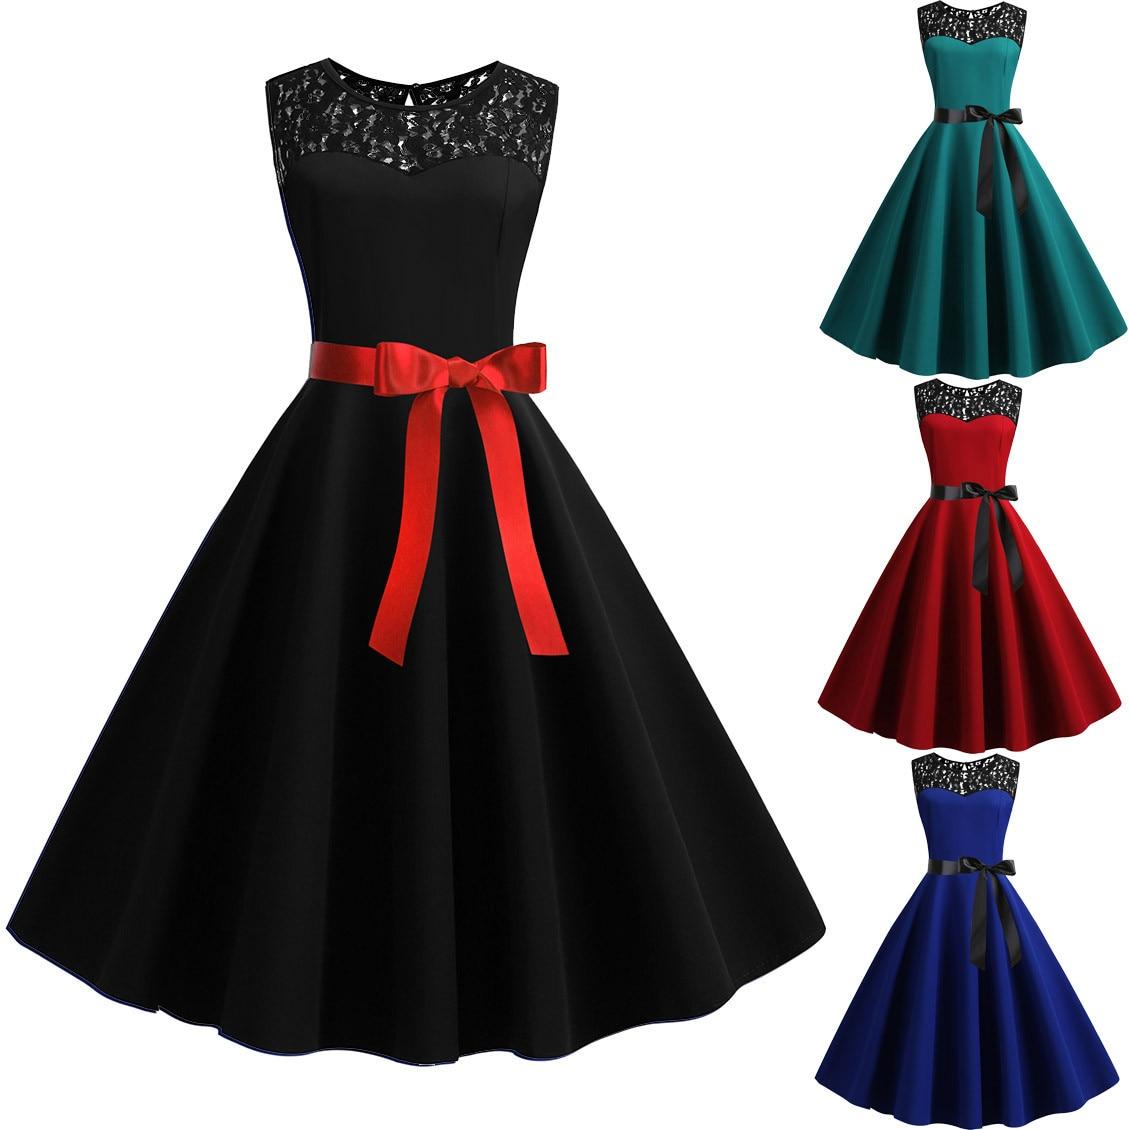 Brand New Women Vintage 1950s Retro Sleeveless Lace Splice Solid Party Prom Swing Dress Women's Clot